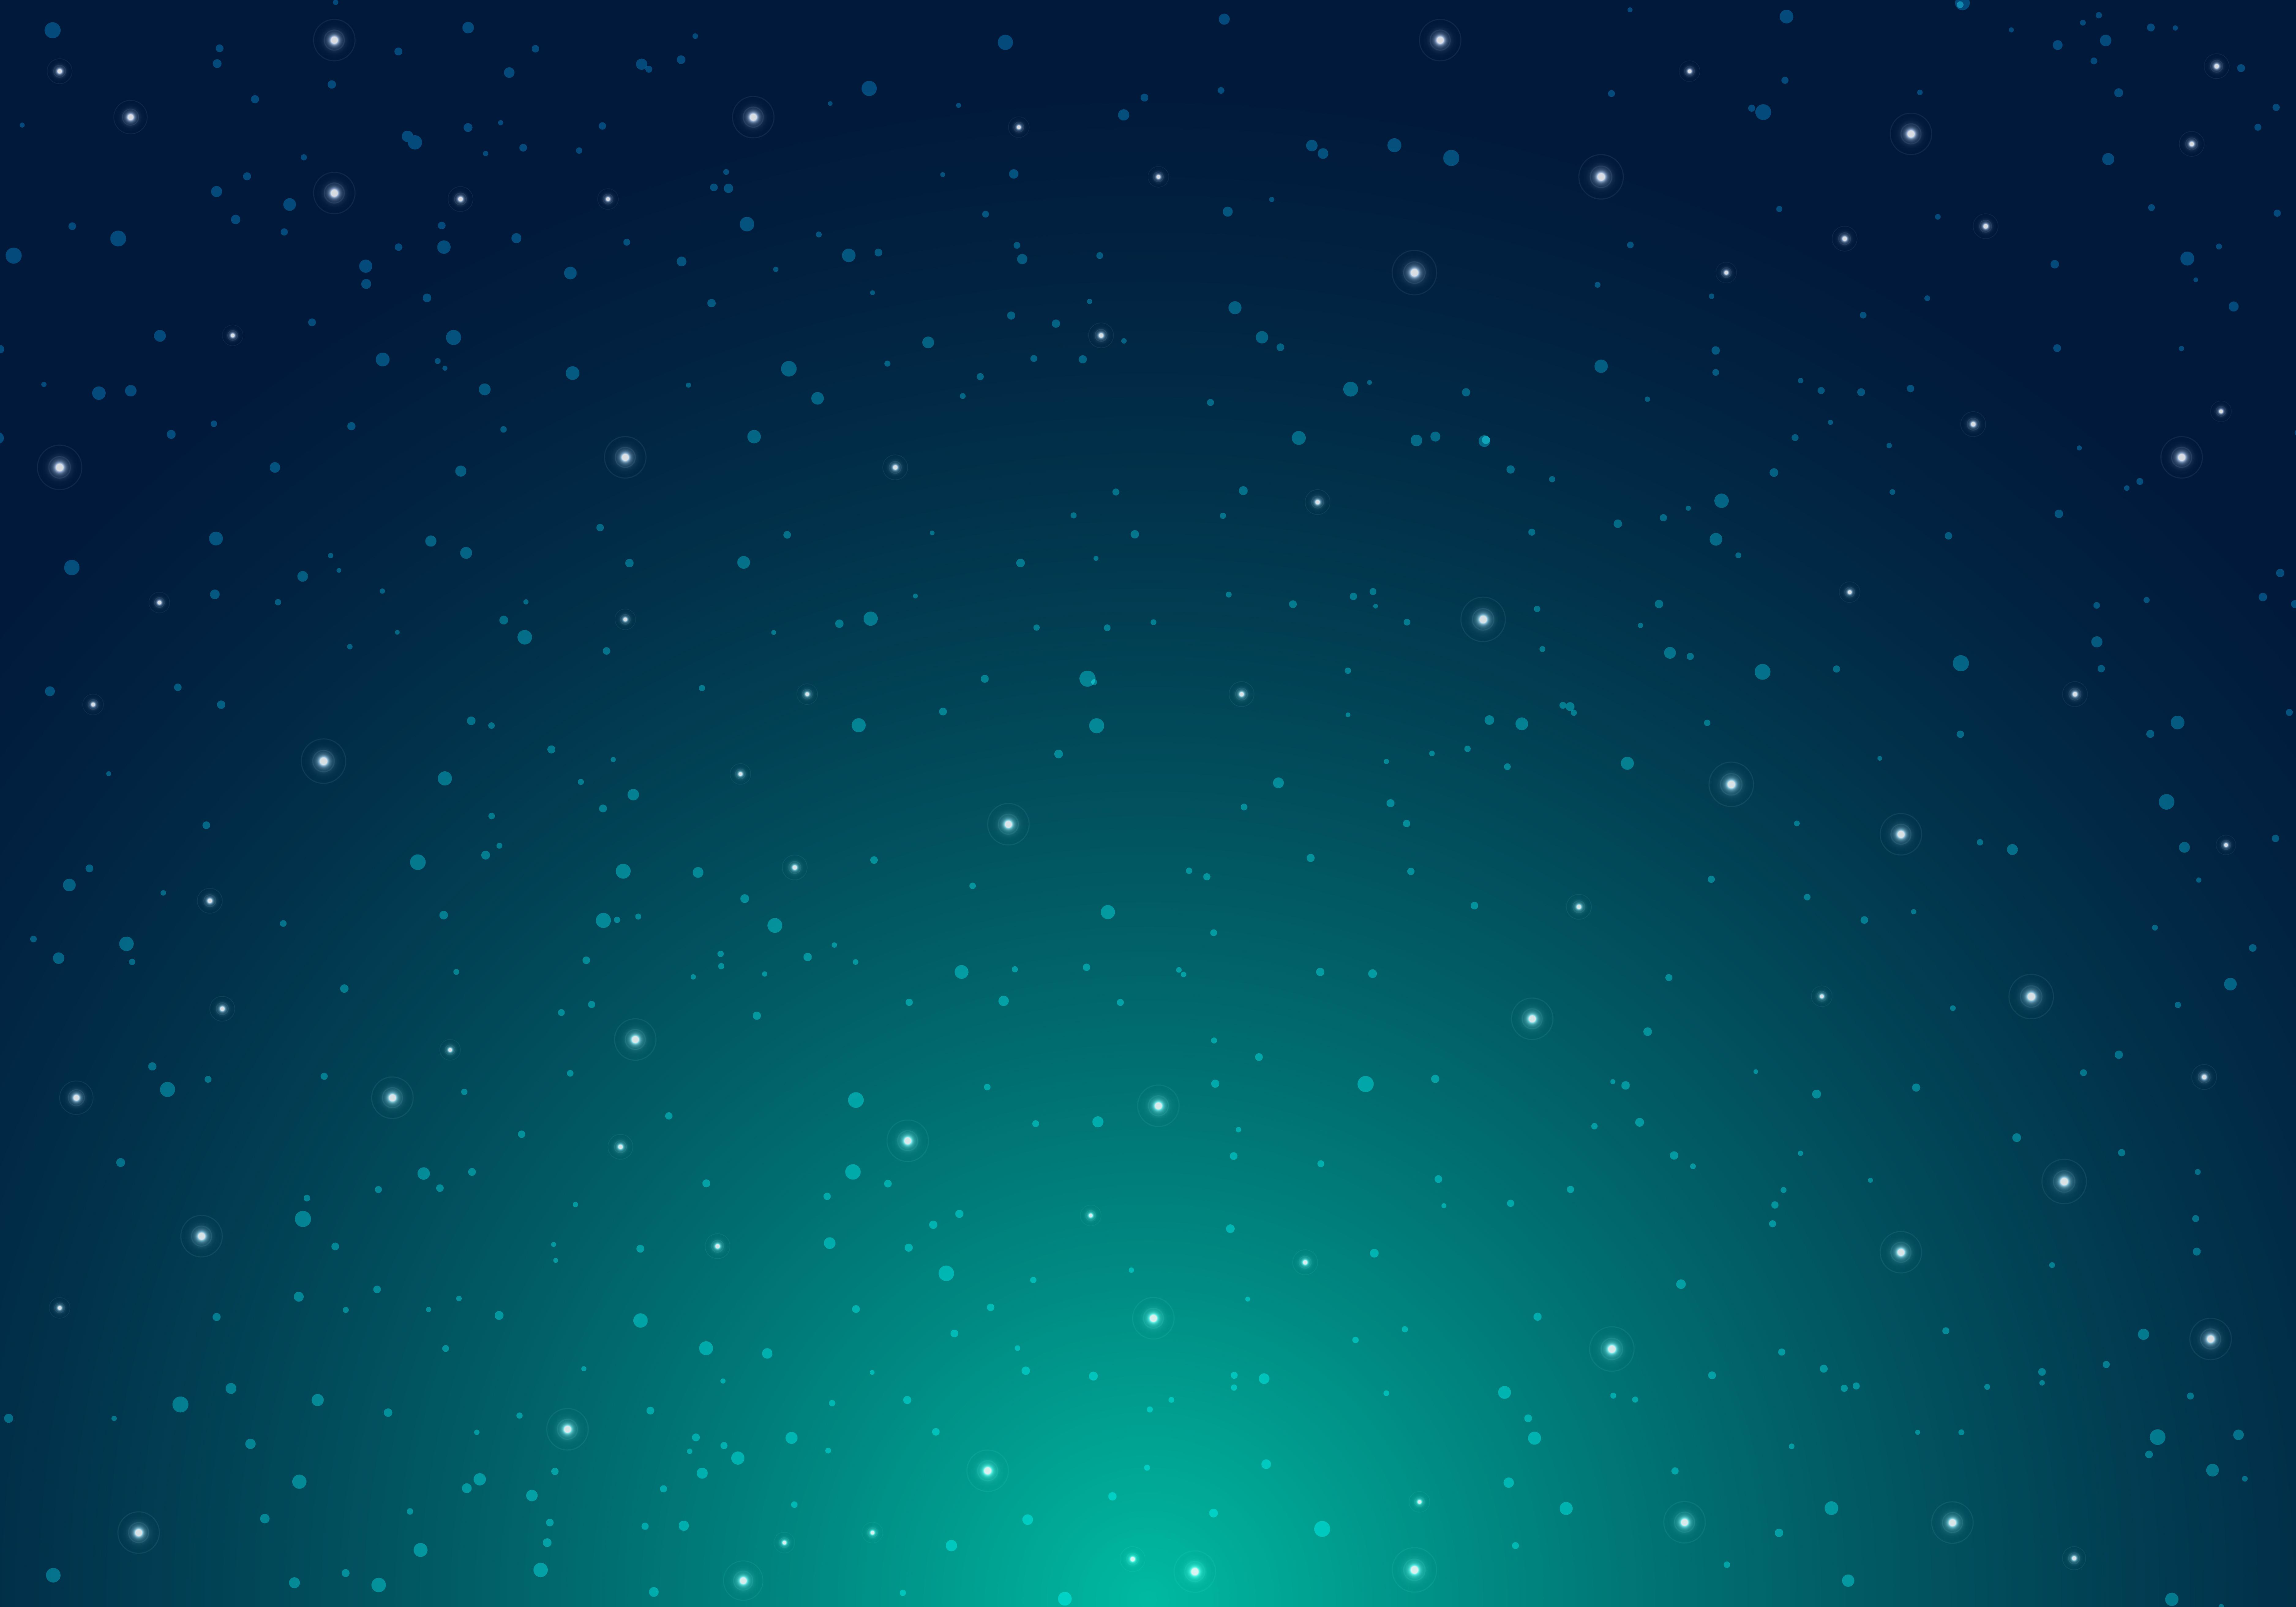 Night Shining Starry Night Sky With Stars Universe Space